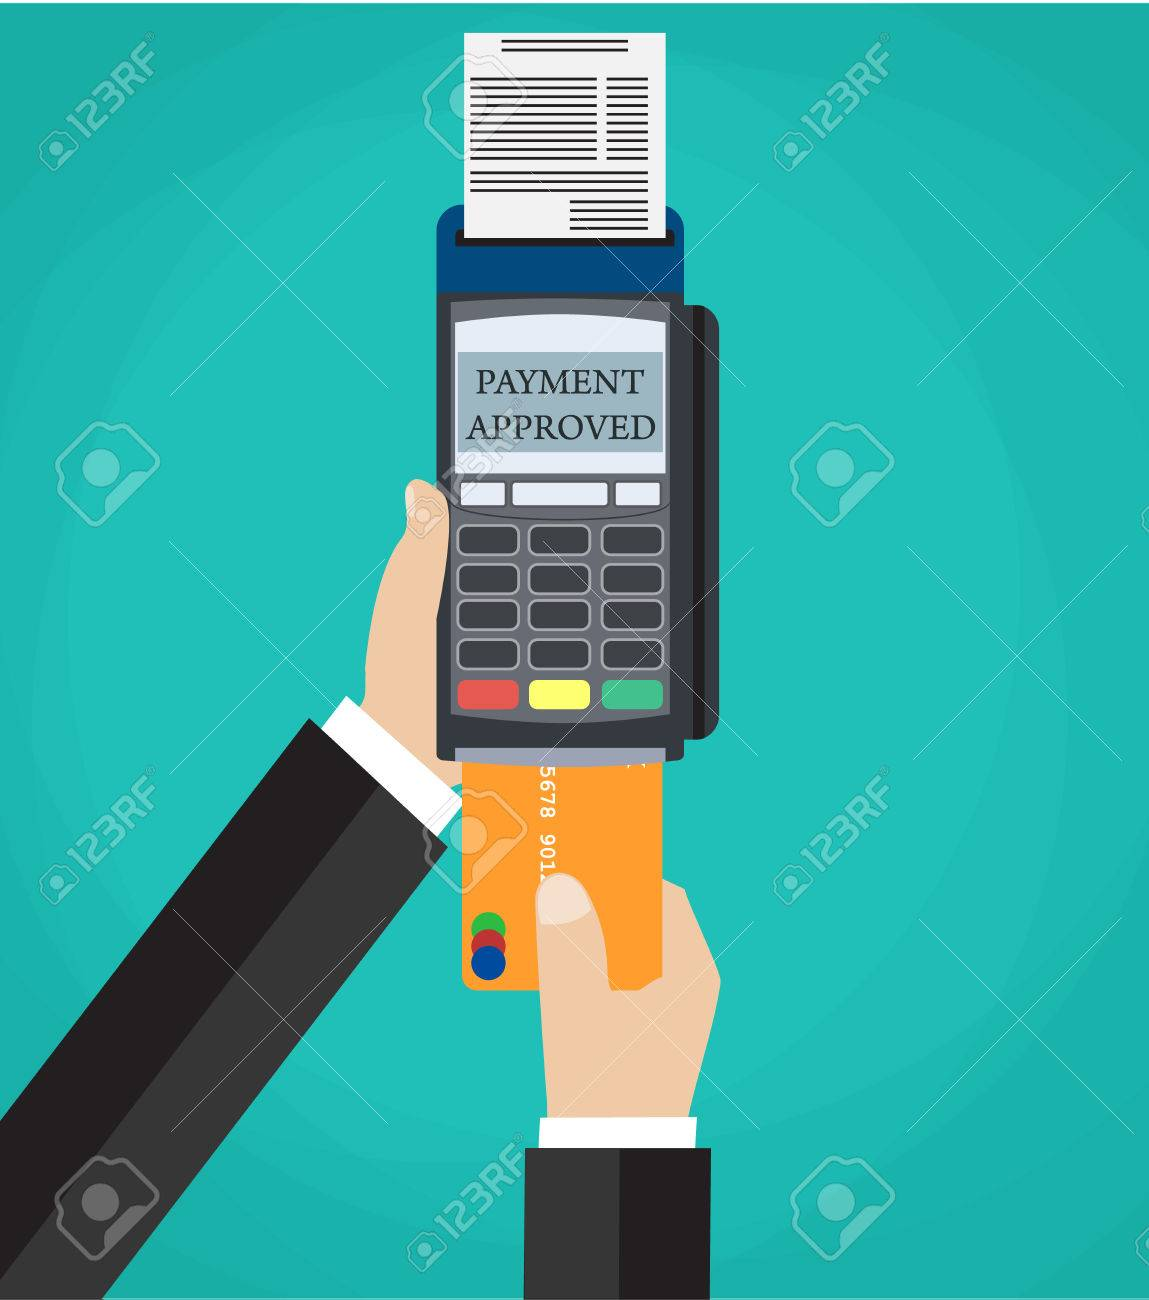 Hand pushing credit card in to pos terminal  using credit debit